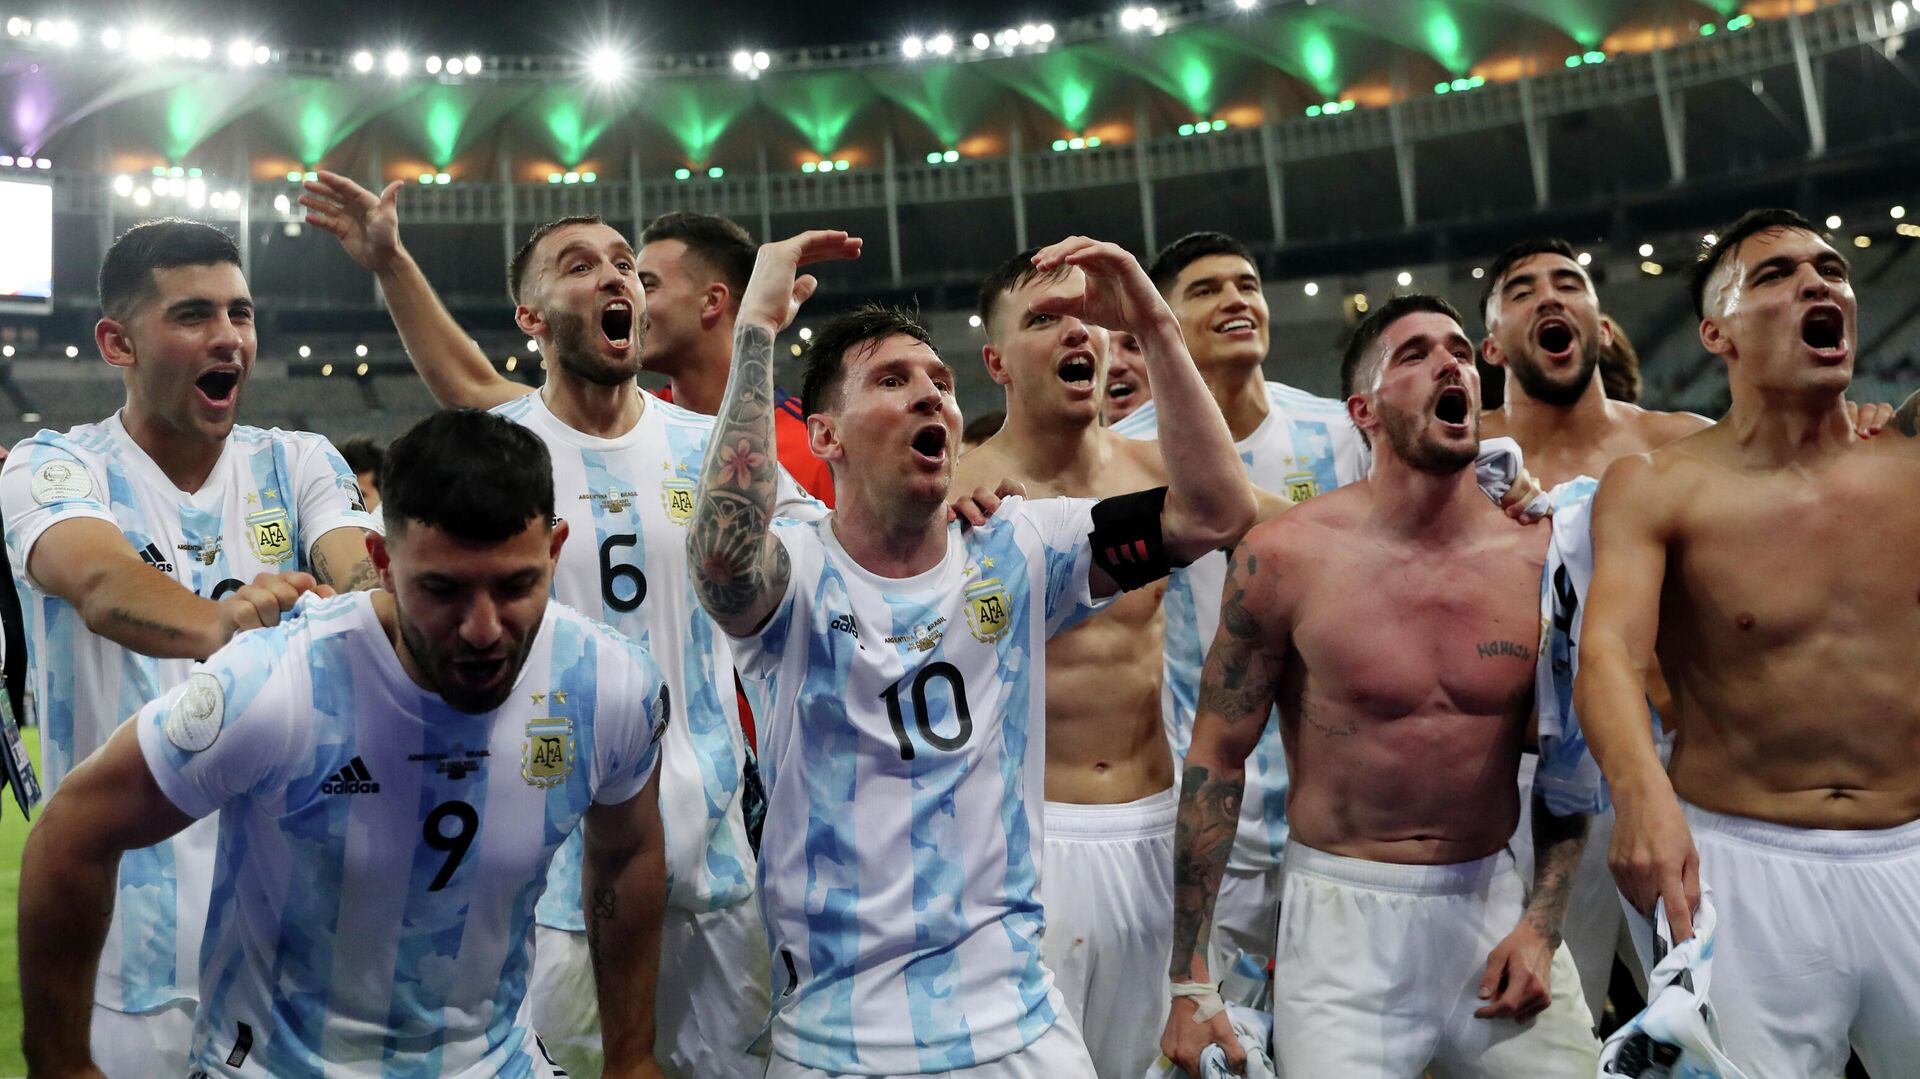 Selección de Argentina - Sputnik Mundo, 1920, 13.07.2021